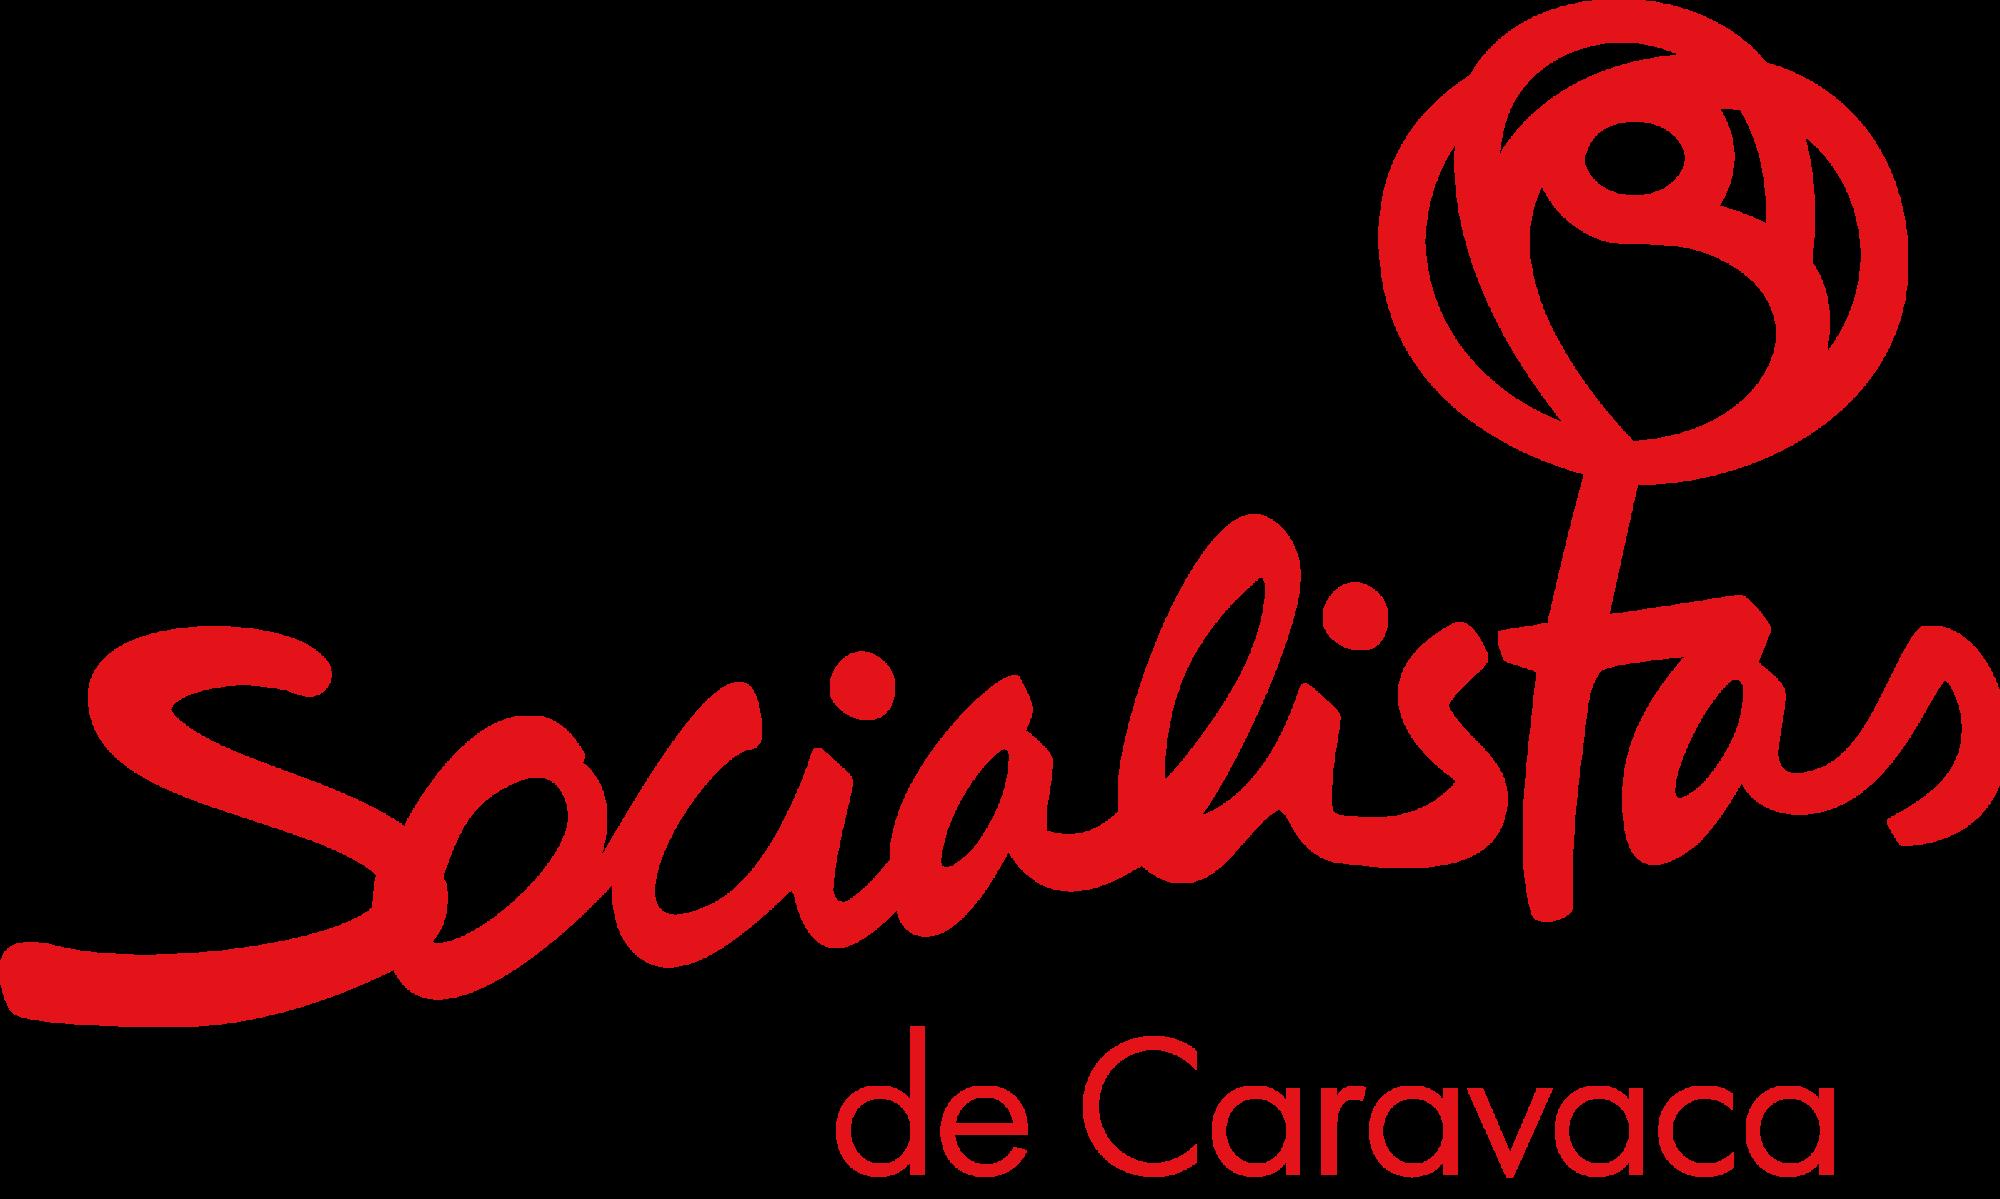 www.socialistasdecaravaca.net